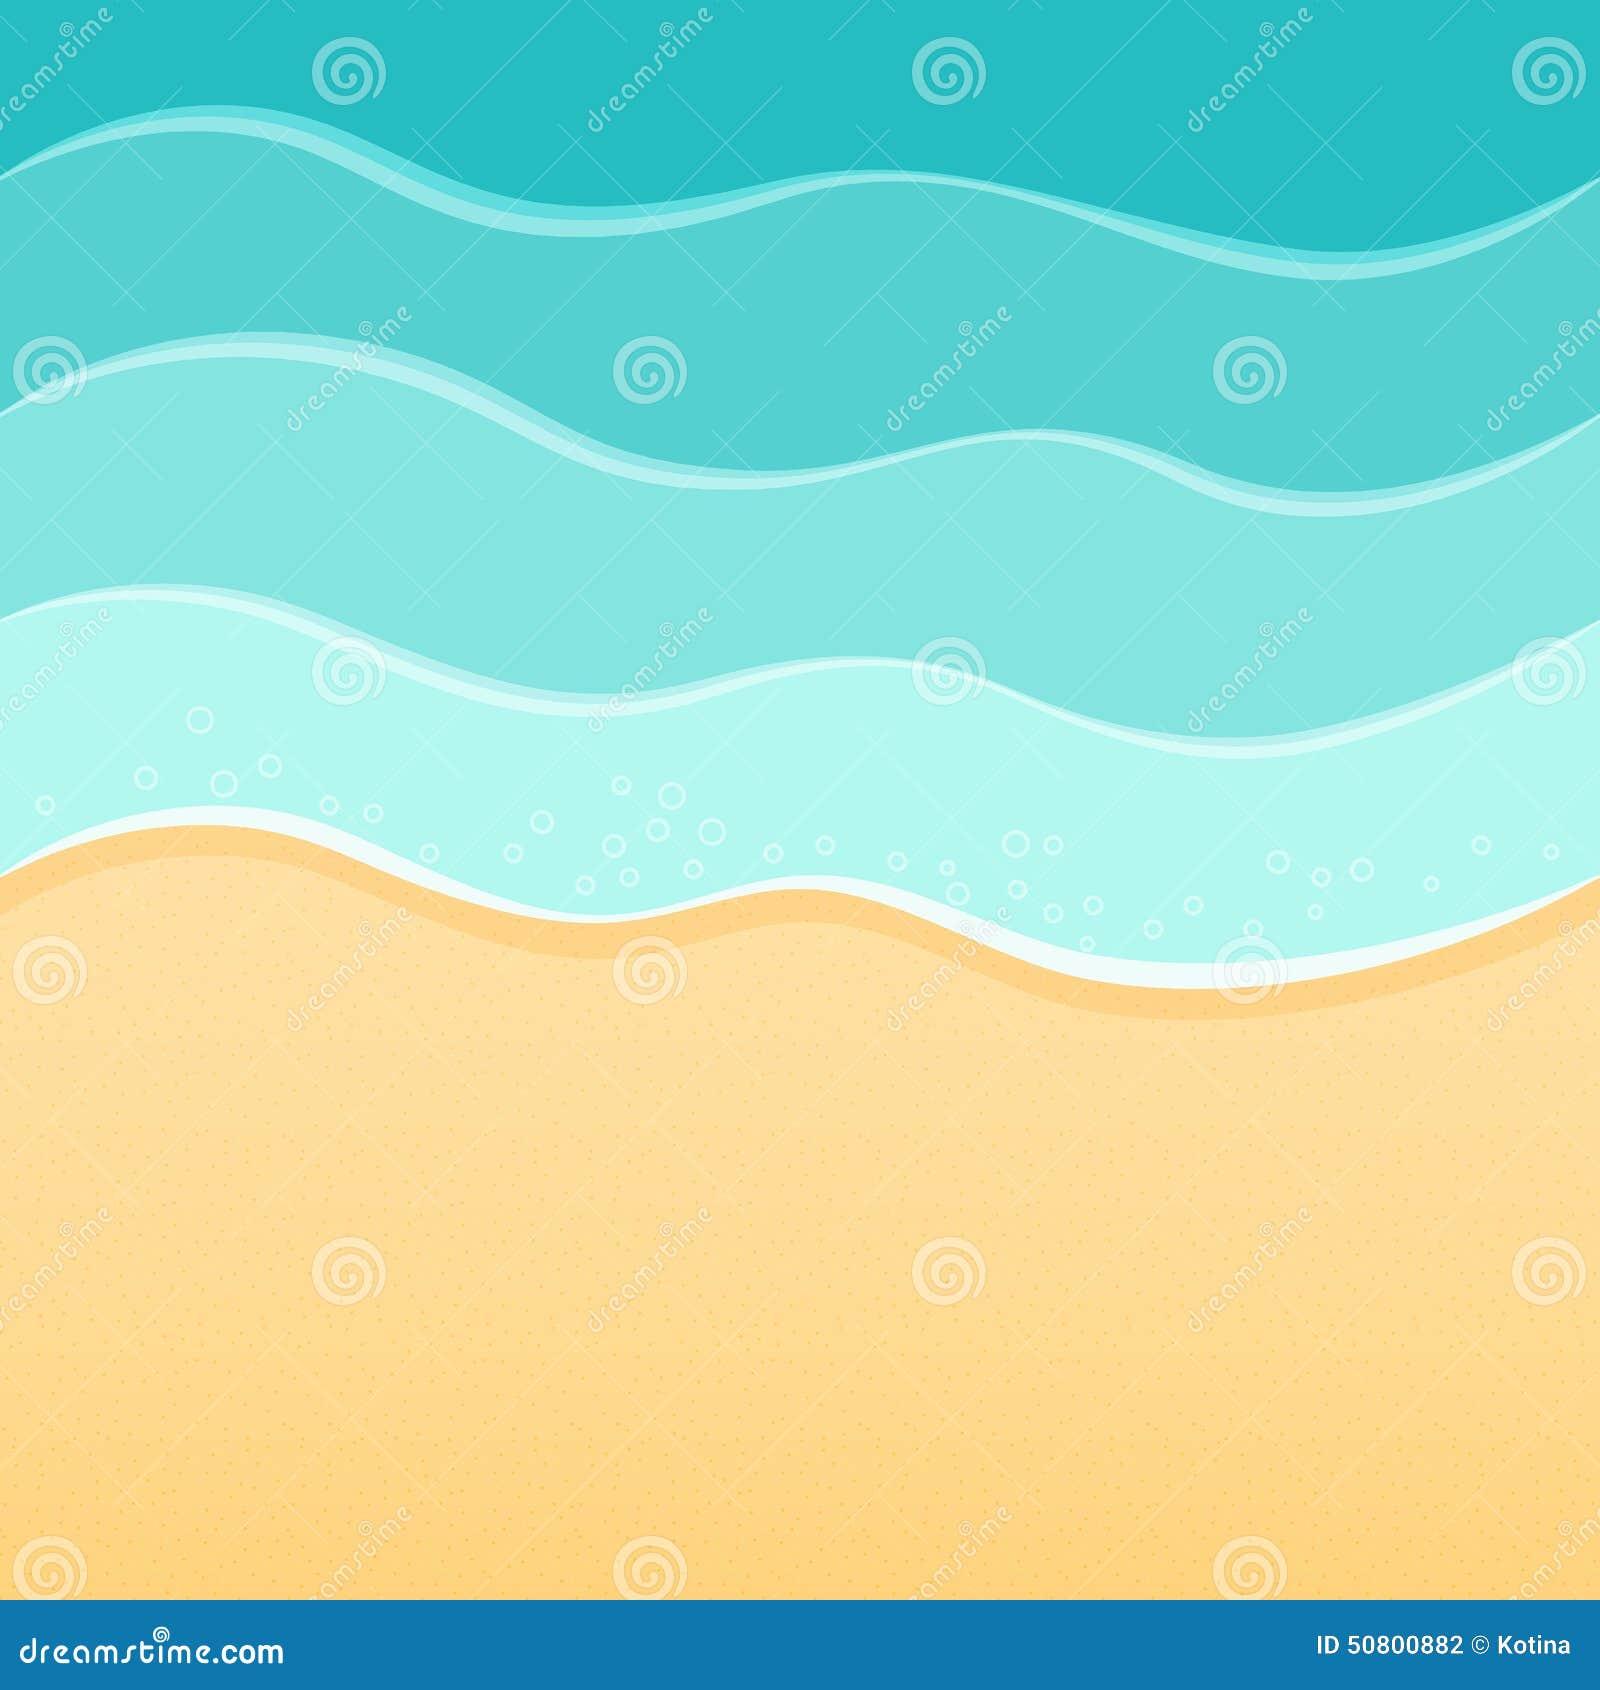 Summer Sea Beach Background Waves And Sand Travel Resort